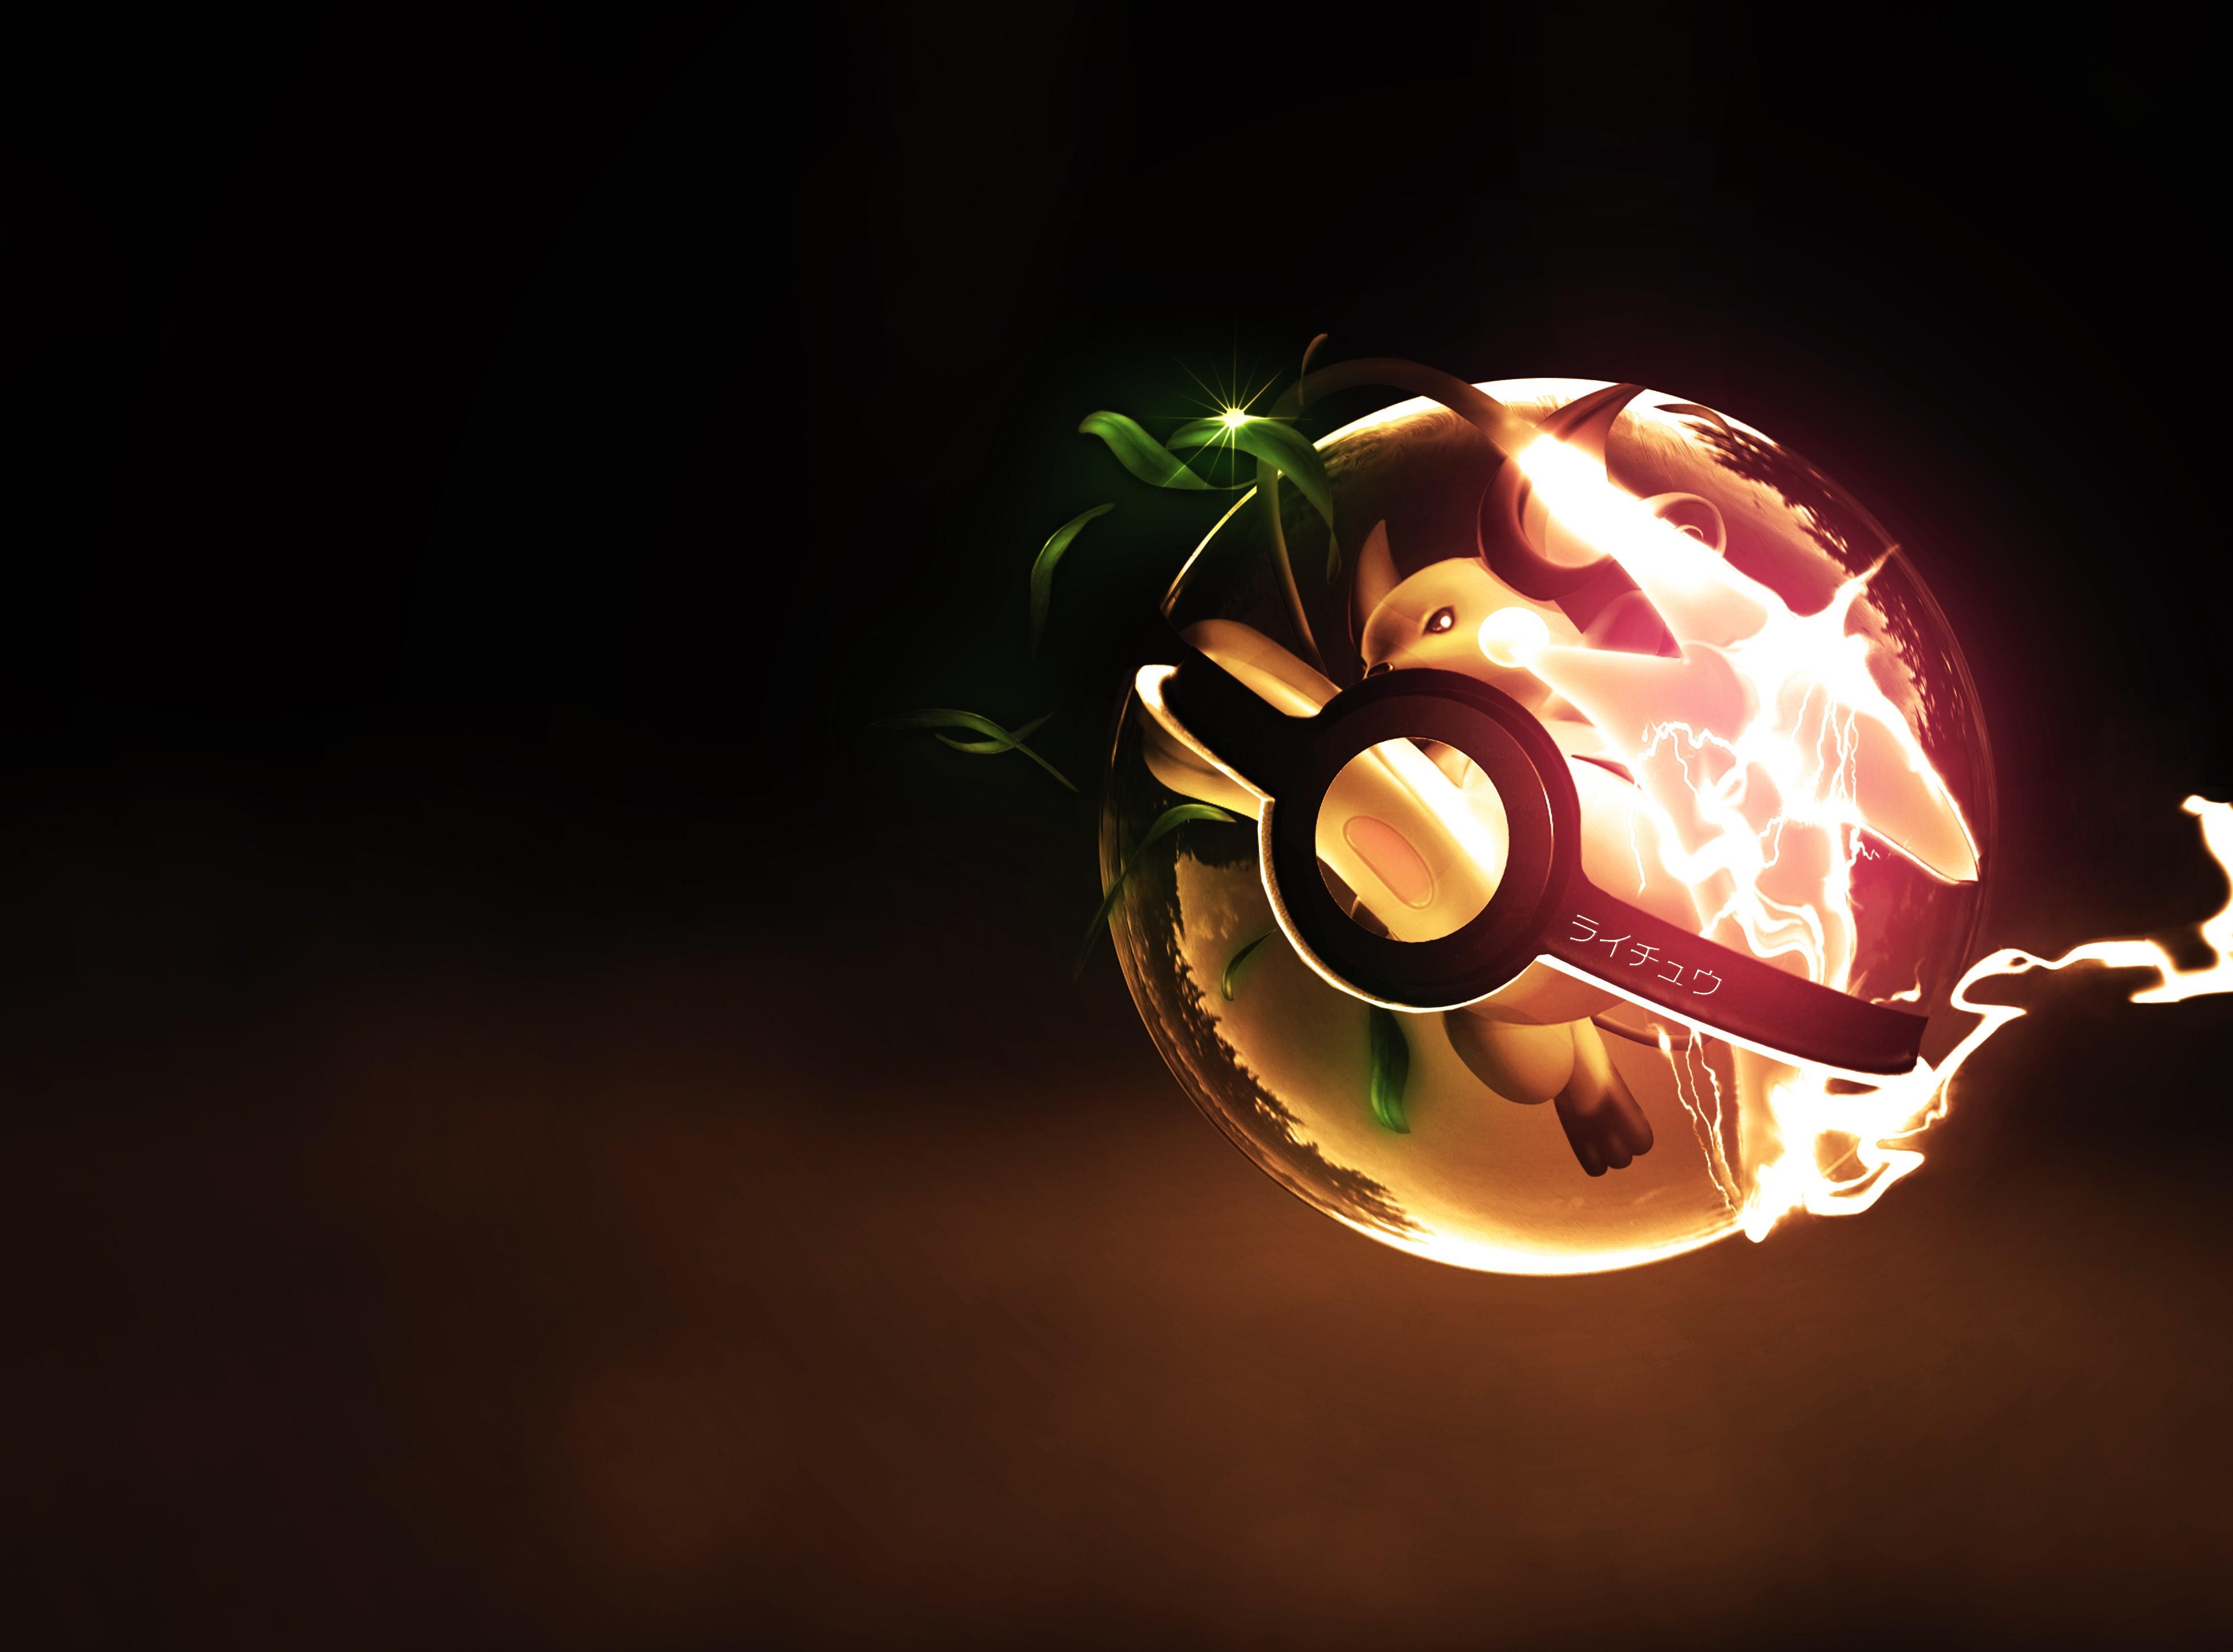 Cool Backgrounds Hd 3d Pokemon